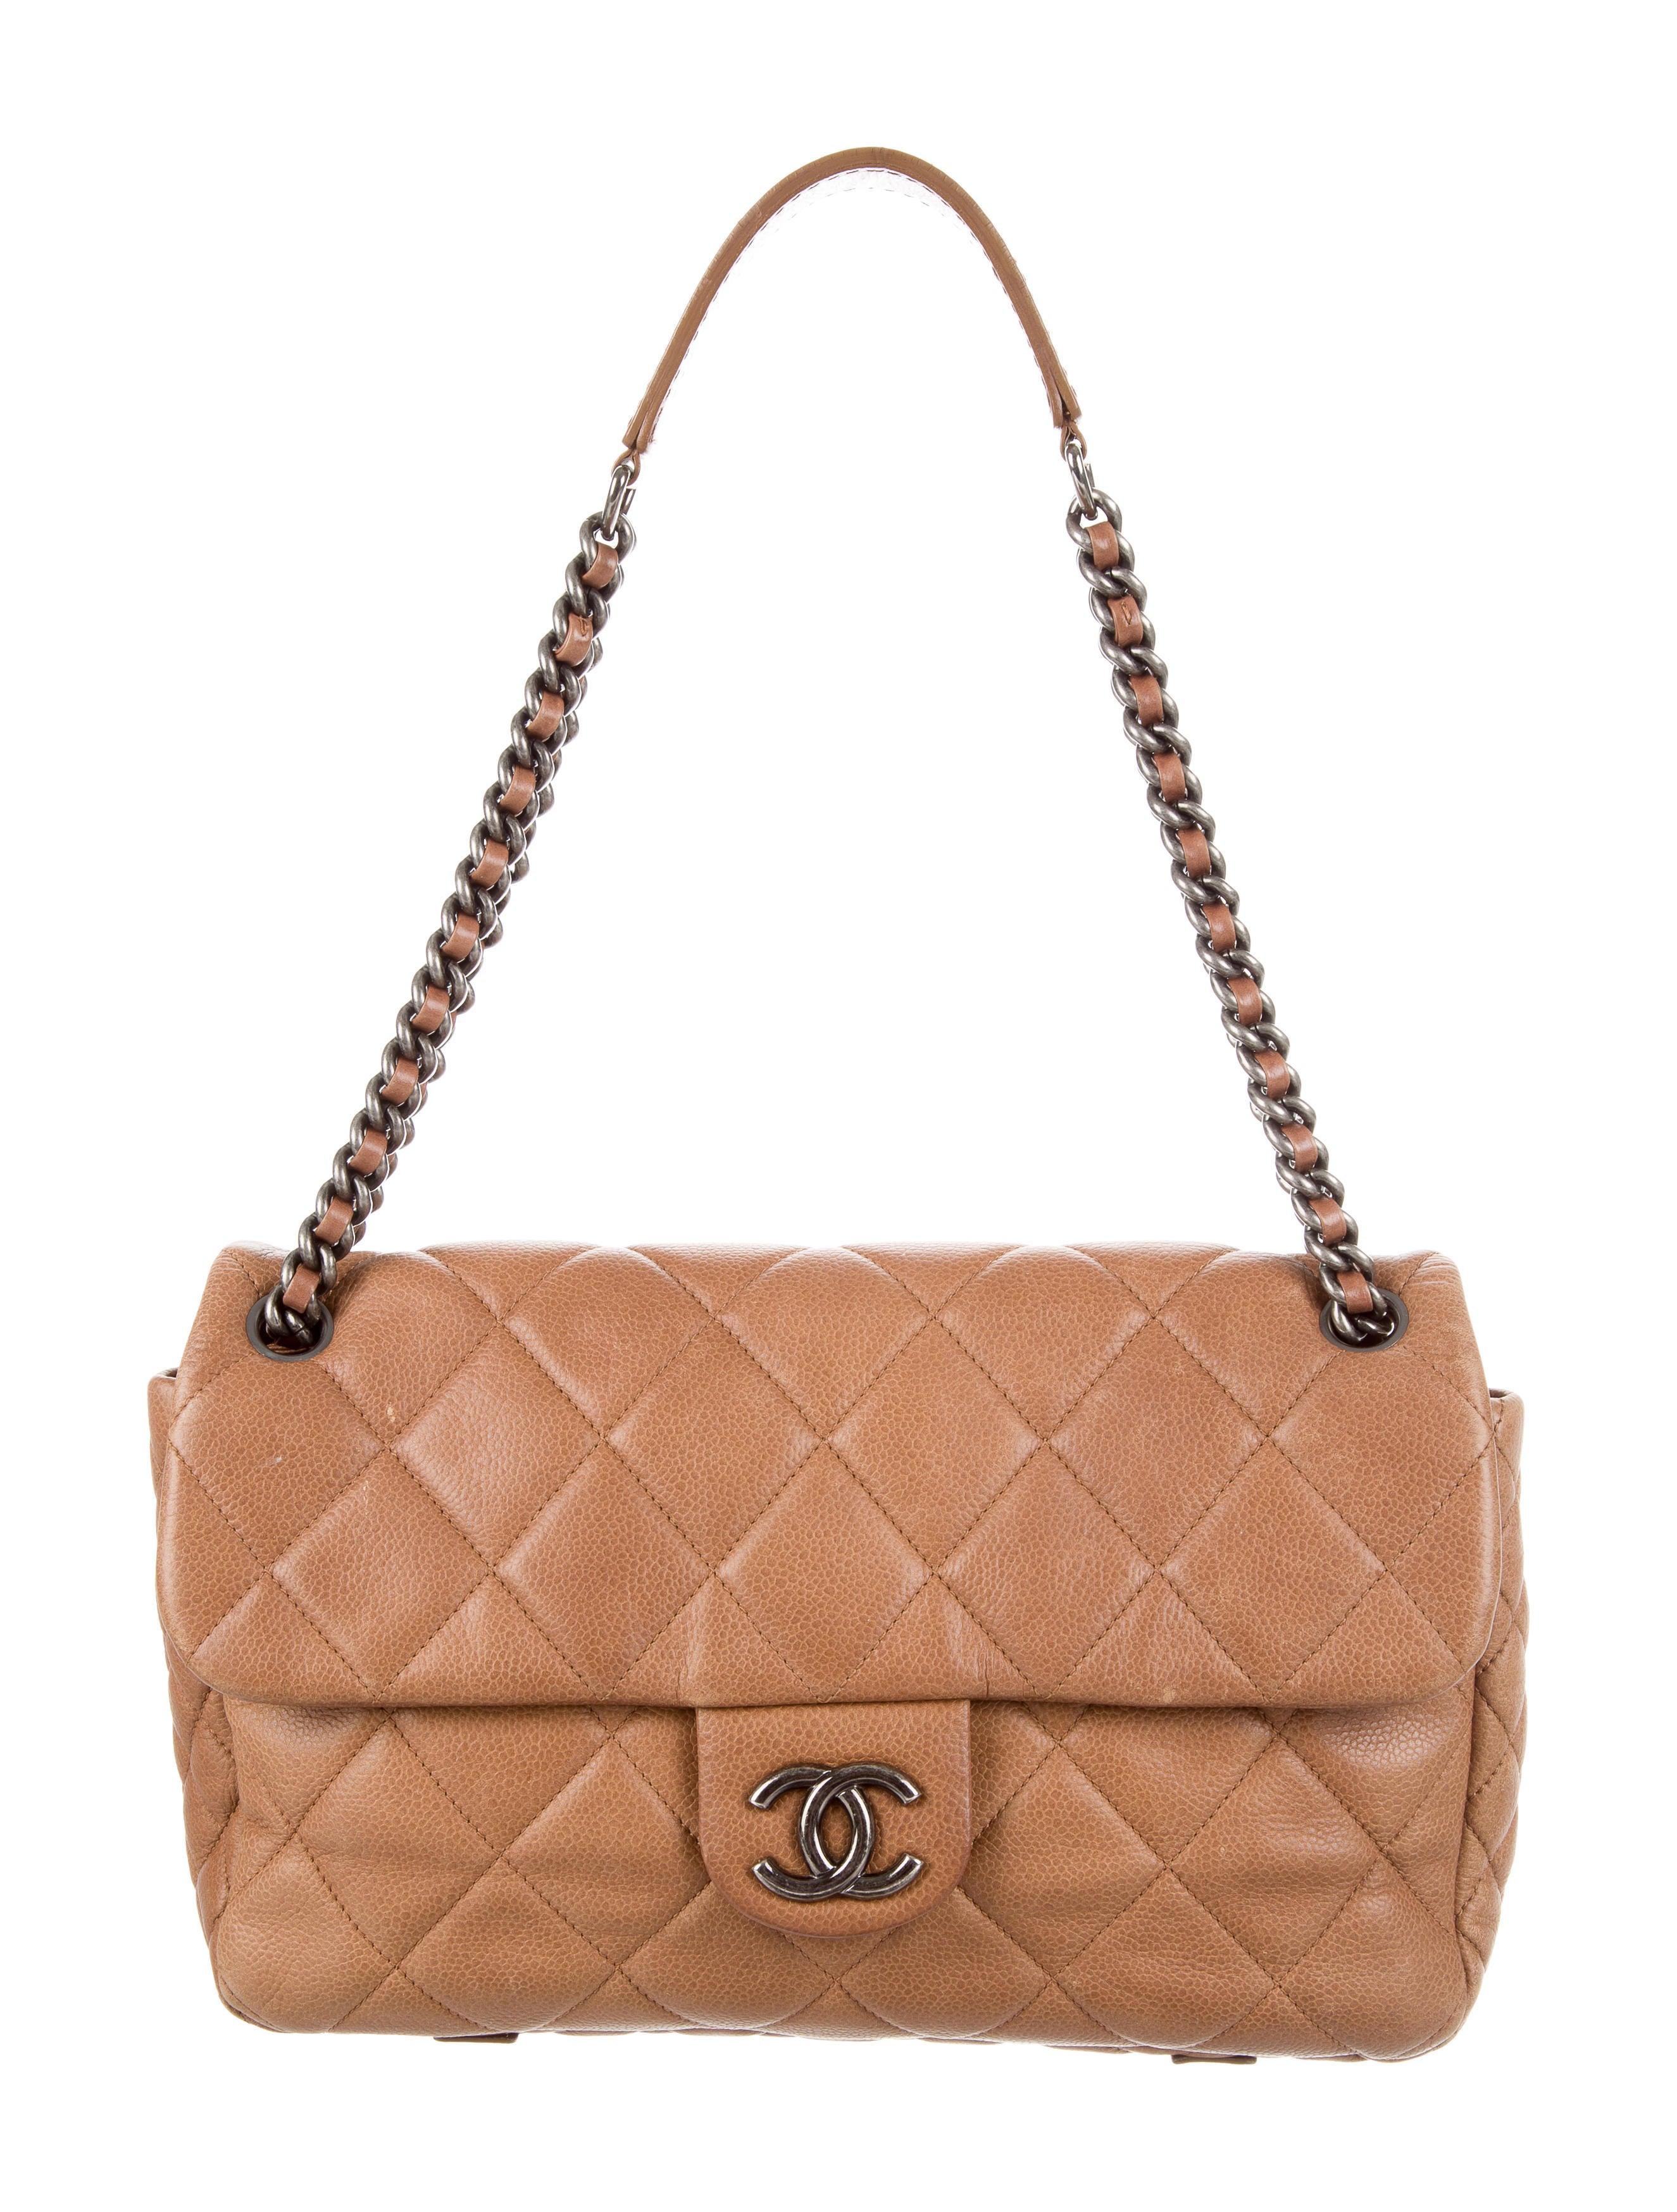 Chanel Coco Casual Flap Bag - Handbags - CHA197377 | The ...